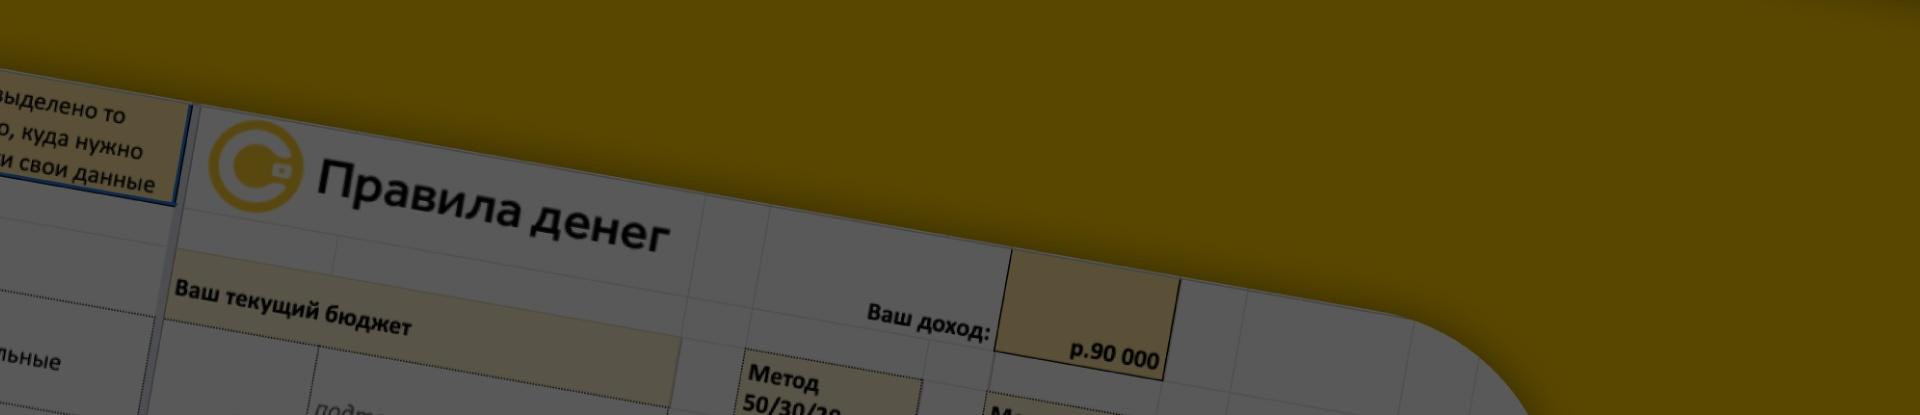 Premium подписка всего за 399 рублей